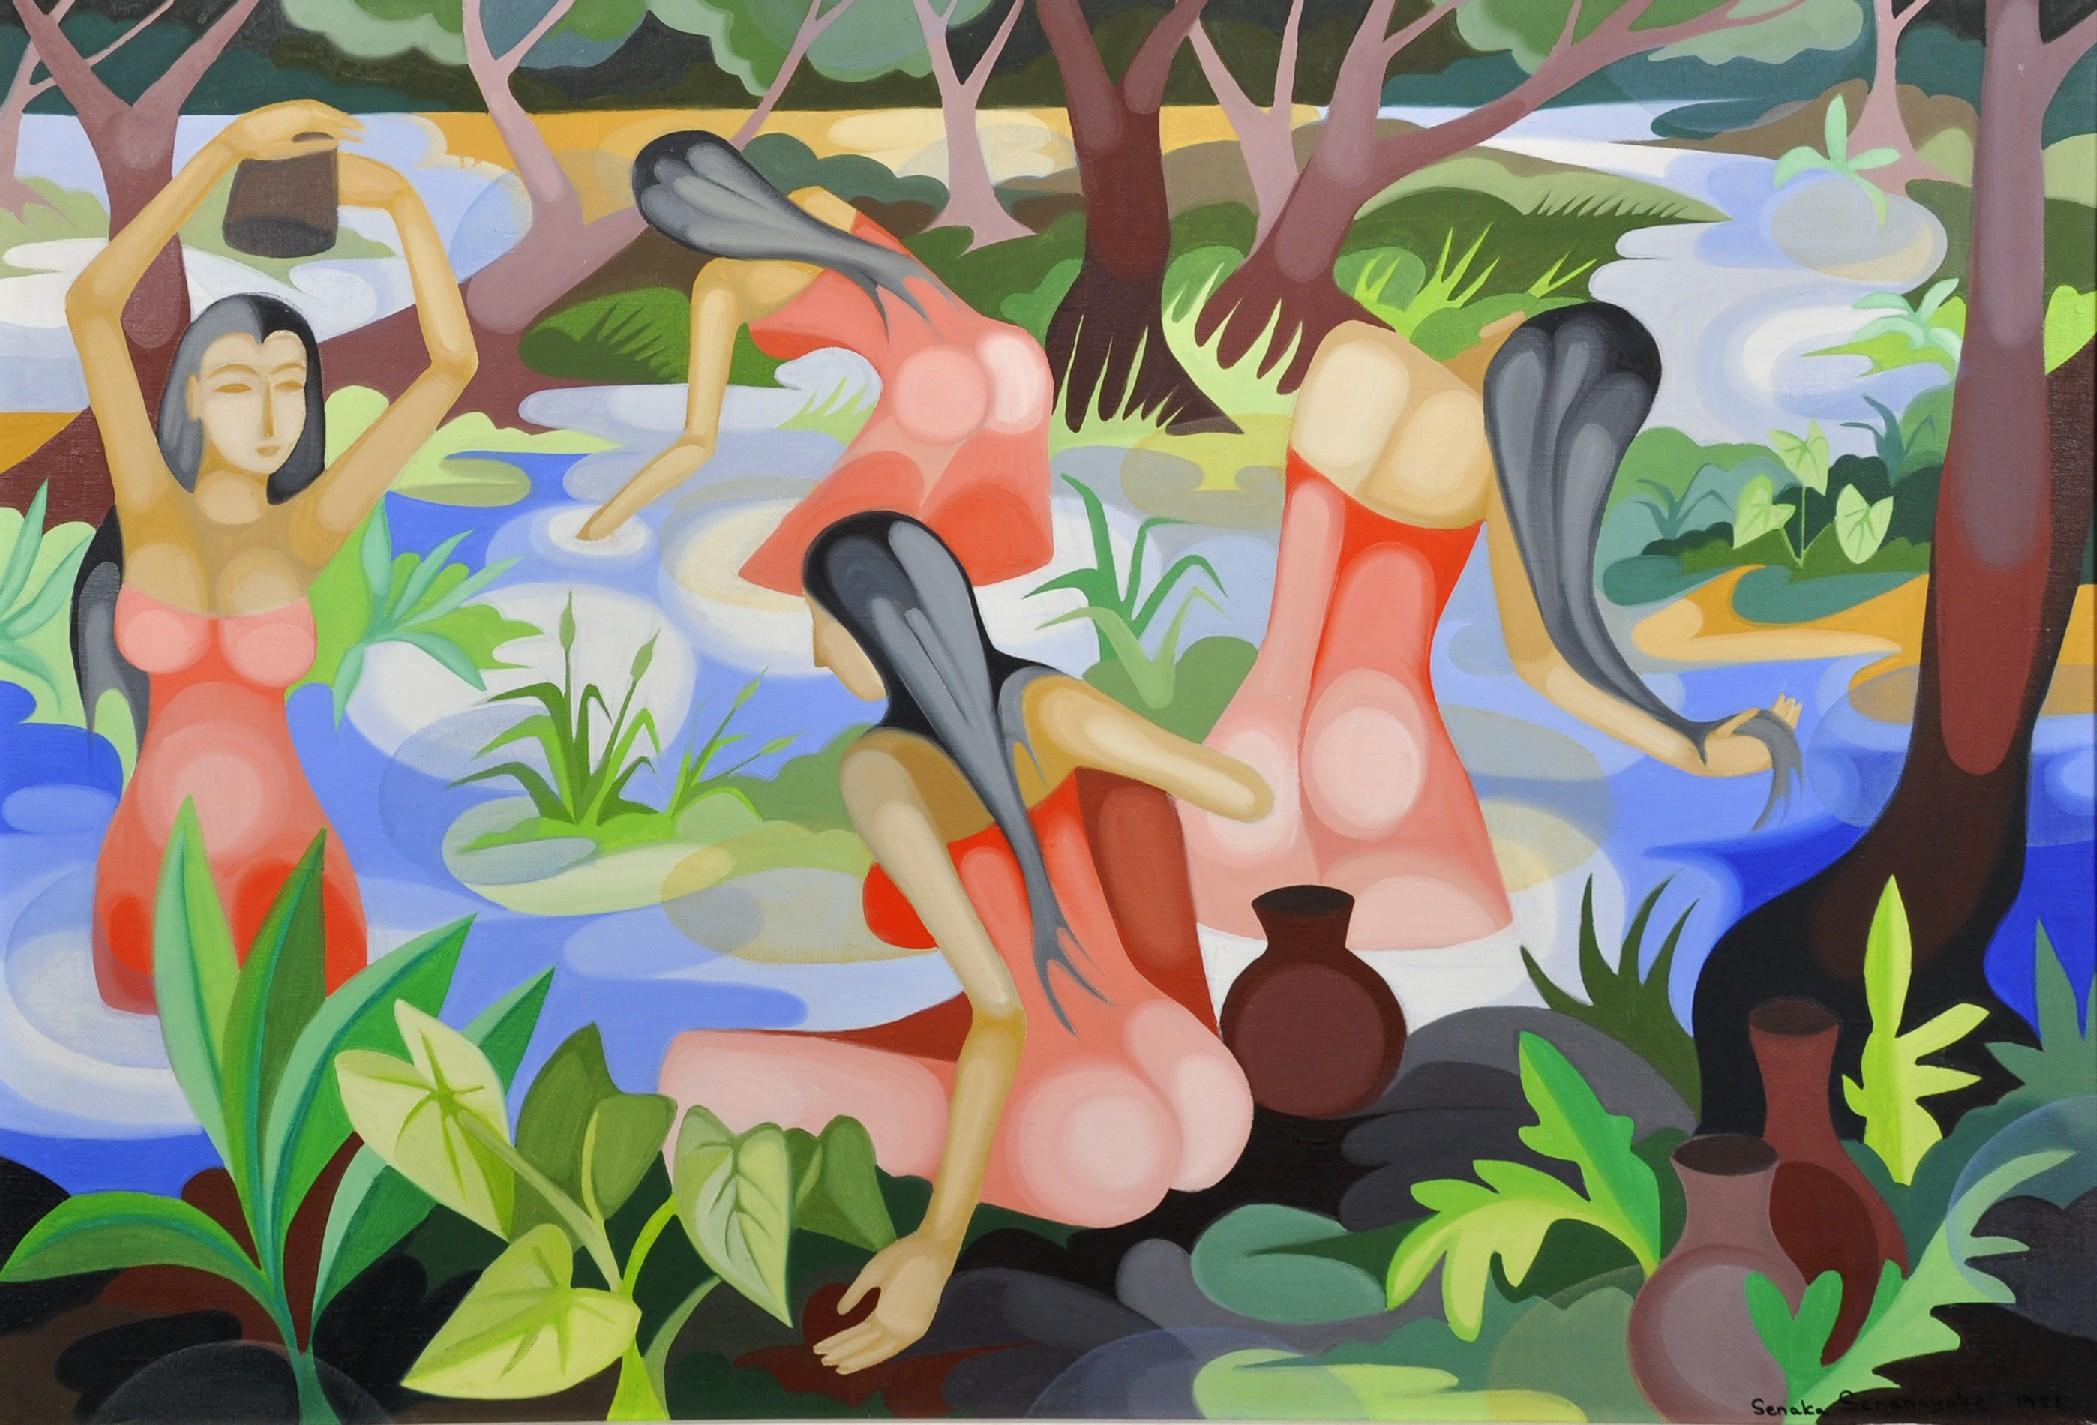 Lot 385 - Senaka Senanayake (1951- ) Sri Lankan. Sri Lankan Beauties Bathing in a Pool, Oil on Canvas,